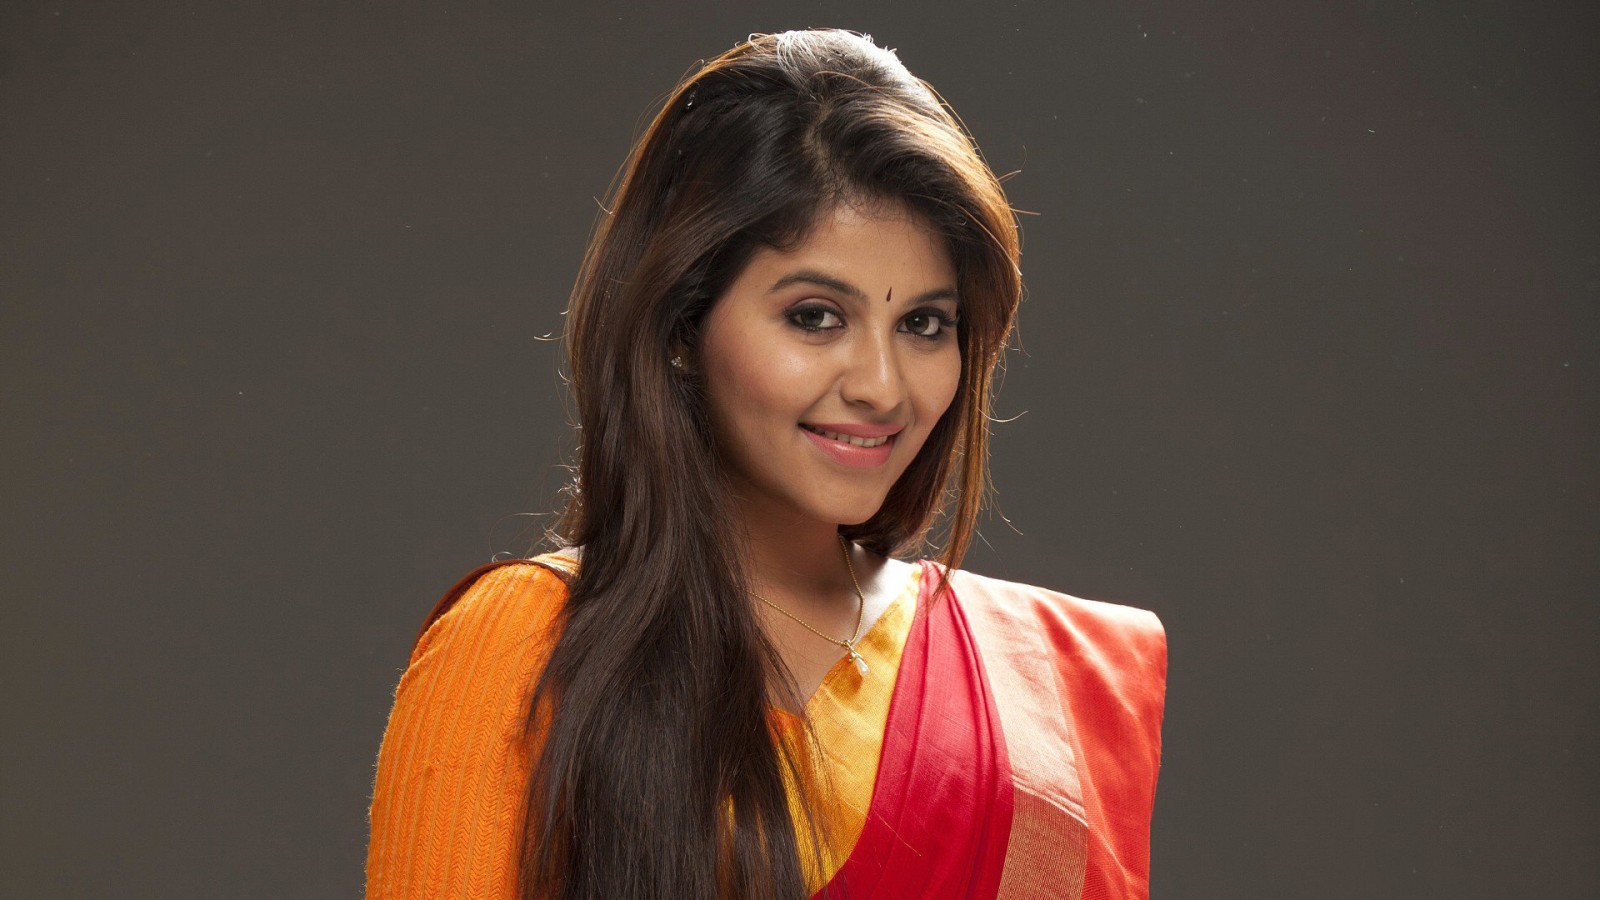 Indian Girl Wallpaper Full Hd Download Anjali Alludu Singam Wallpapers Hd Wallpapers Id 19164